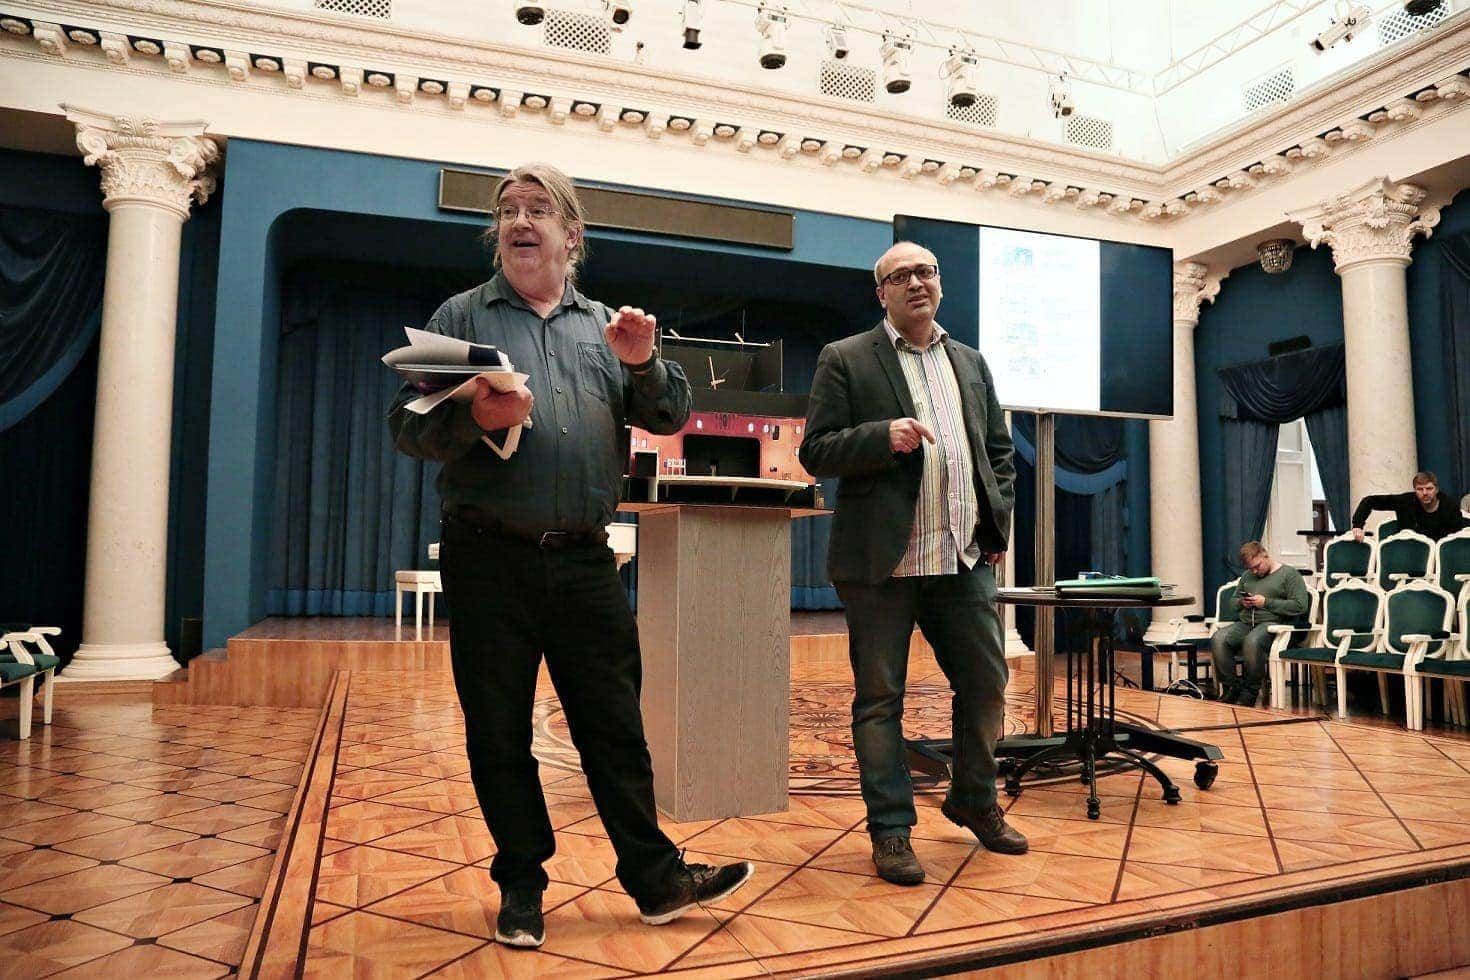 Эндрю Лоуренс-Кинг и Георгий Исаакян. Фото - Ирина Шымчак